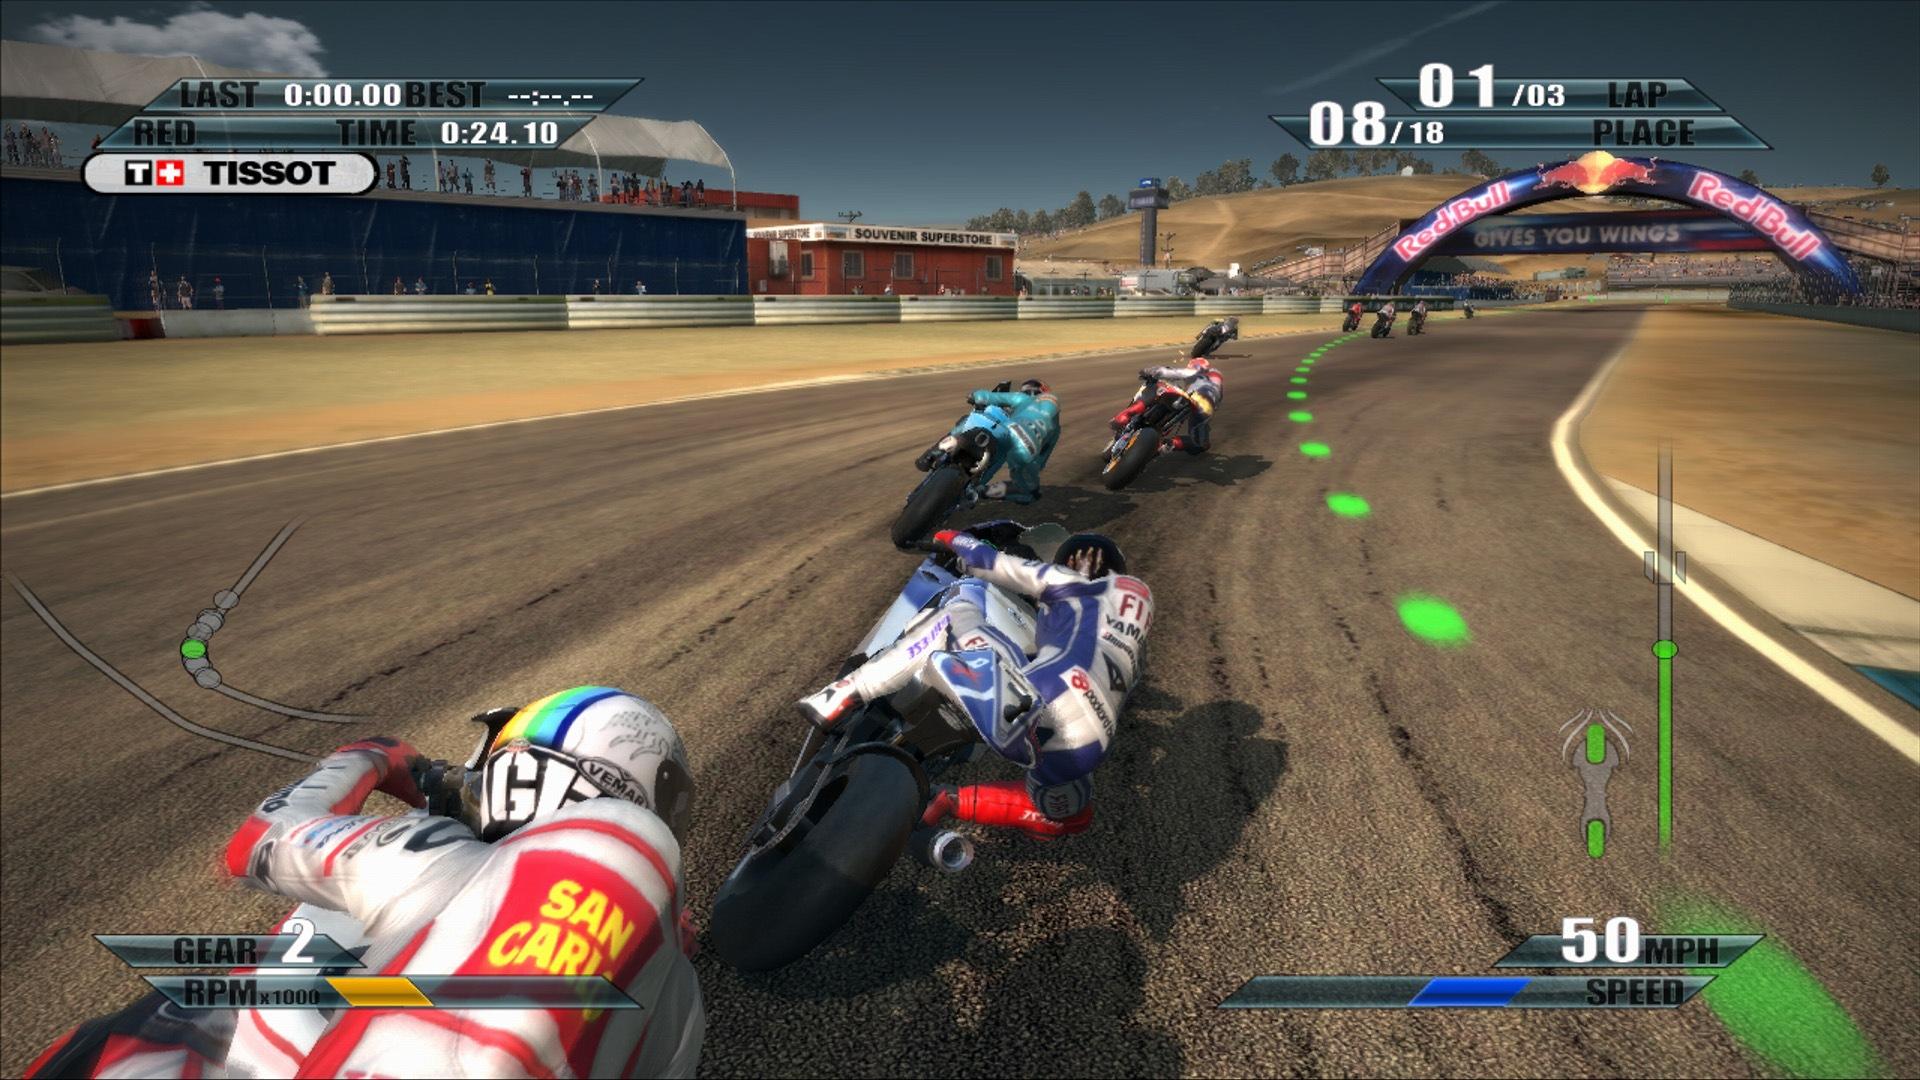 Xbox 360 Moto GP 09/10